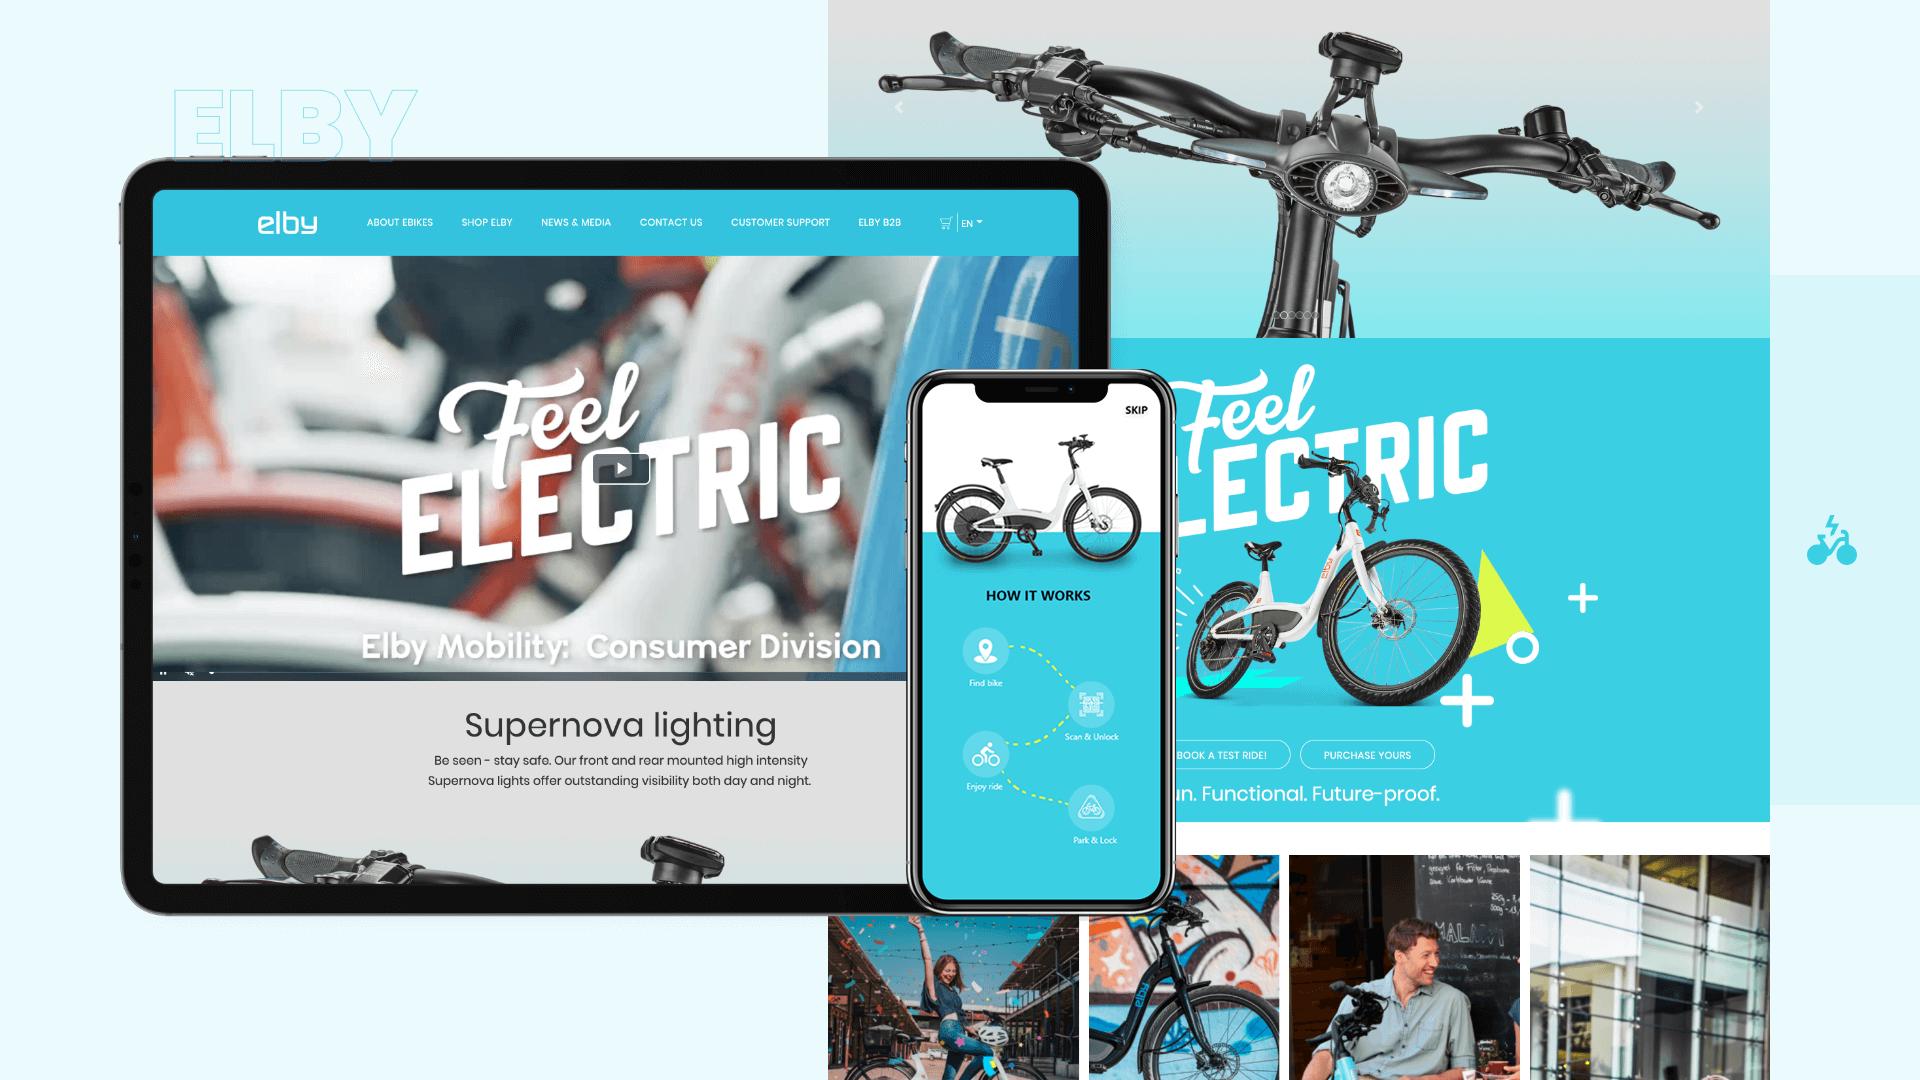 elby mobility webb app